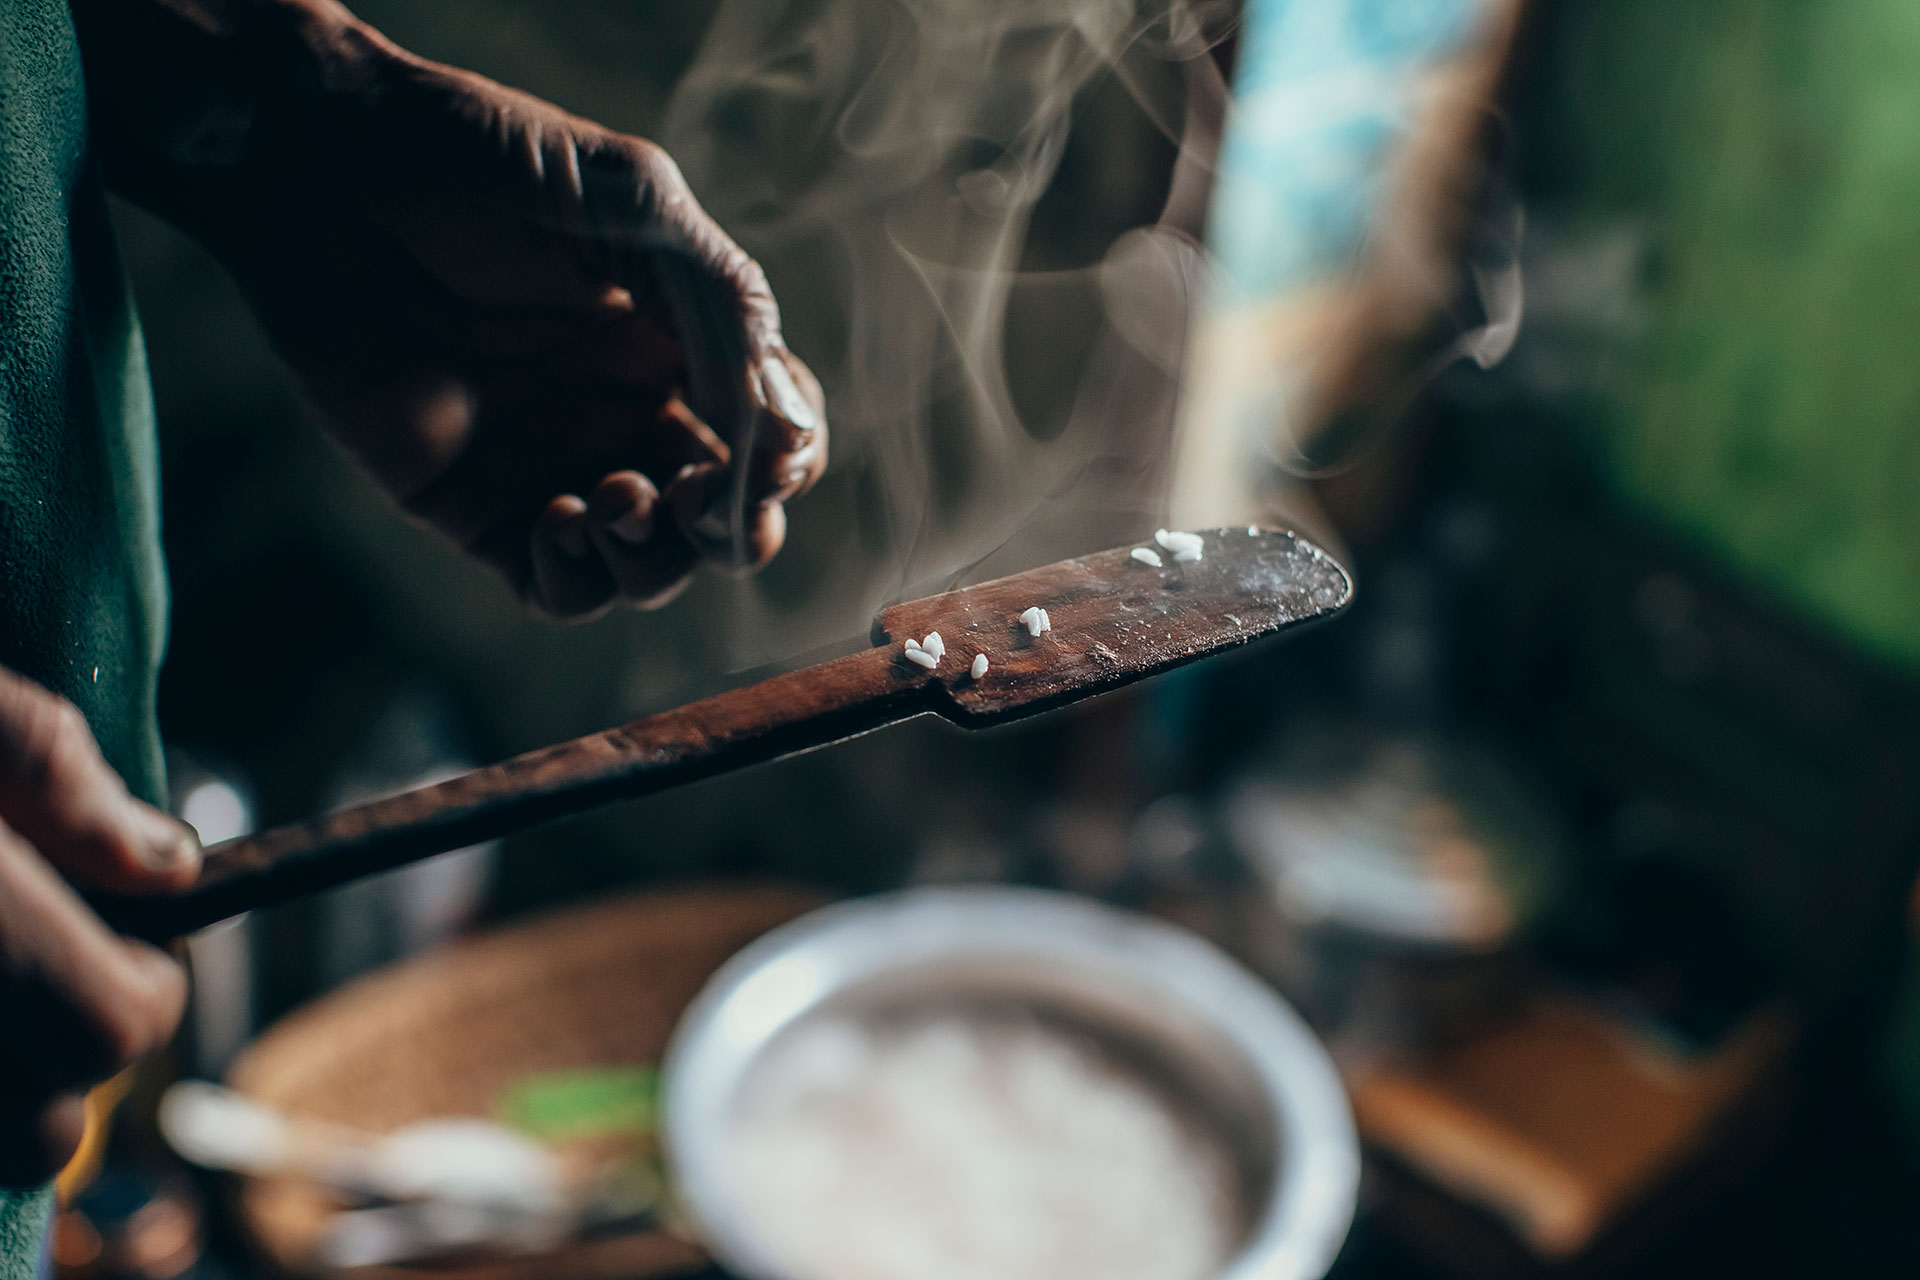 Detail Fotograf Food Kochen Trekking Bhutan People Reis Laya Reisen